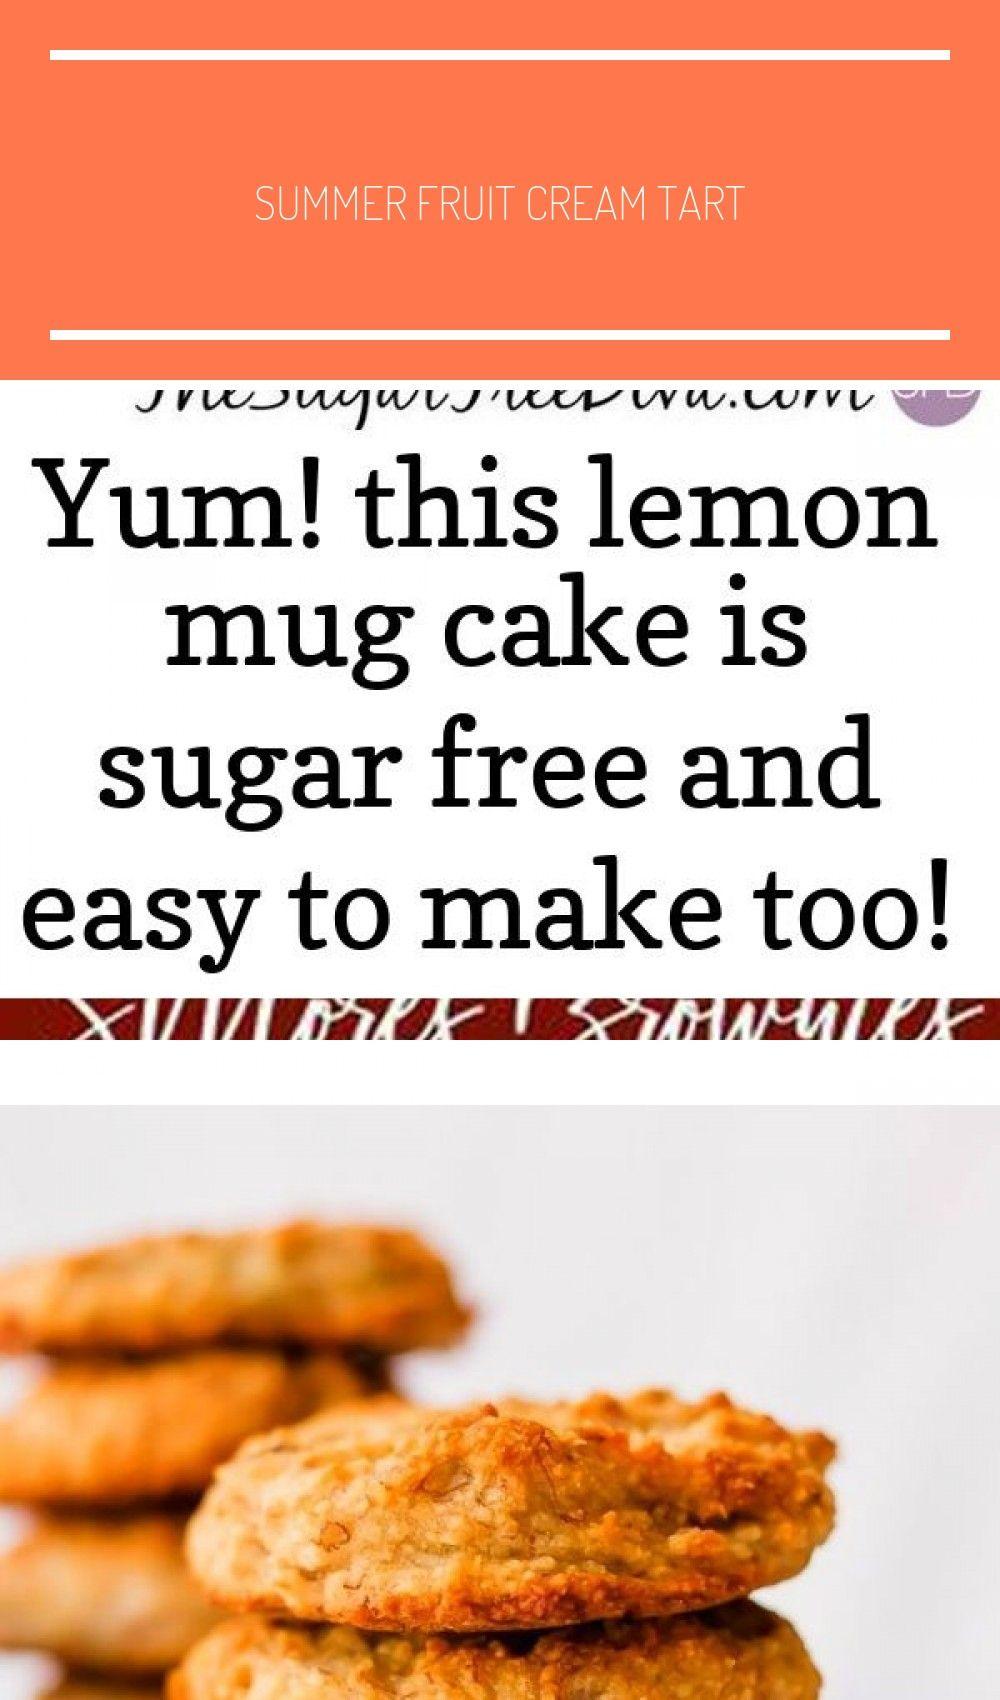 YUM! This lemon mug cake is sugar free and easy to make too! via Smores brownies are so simple to